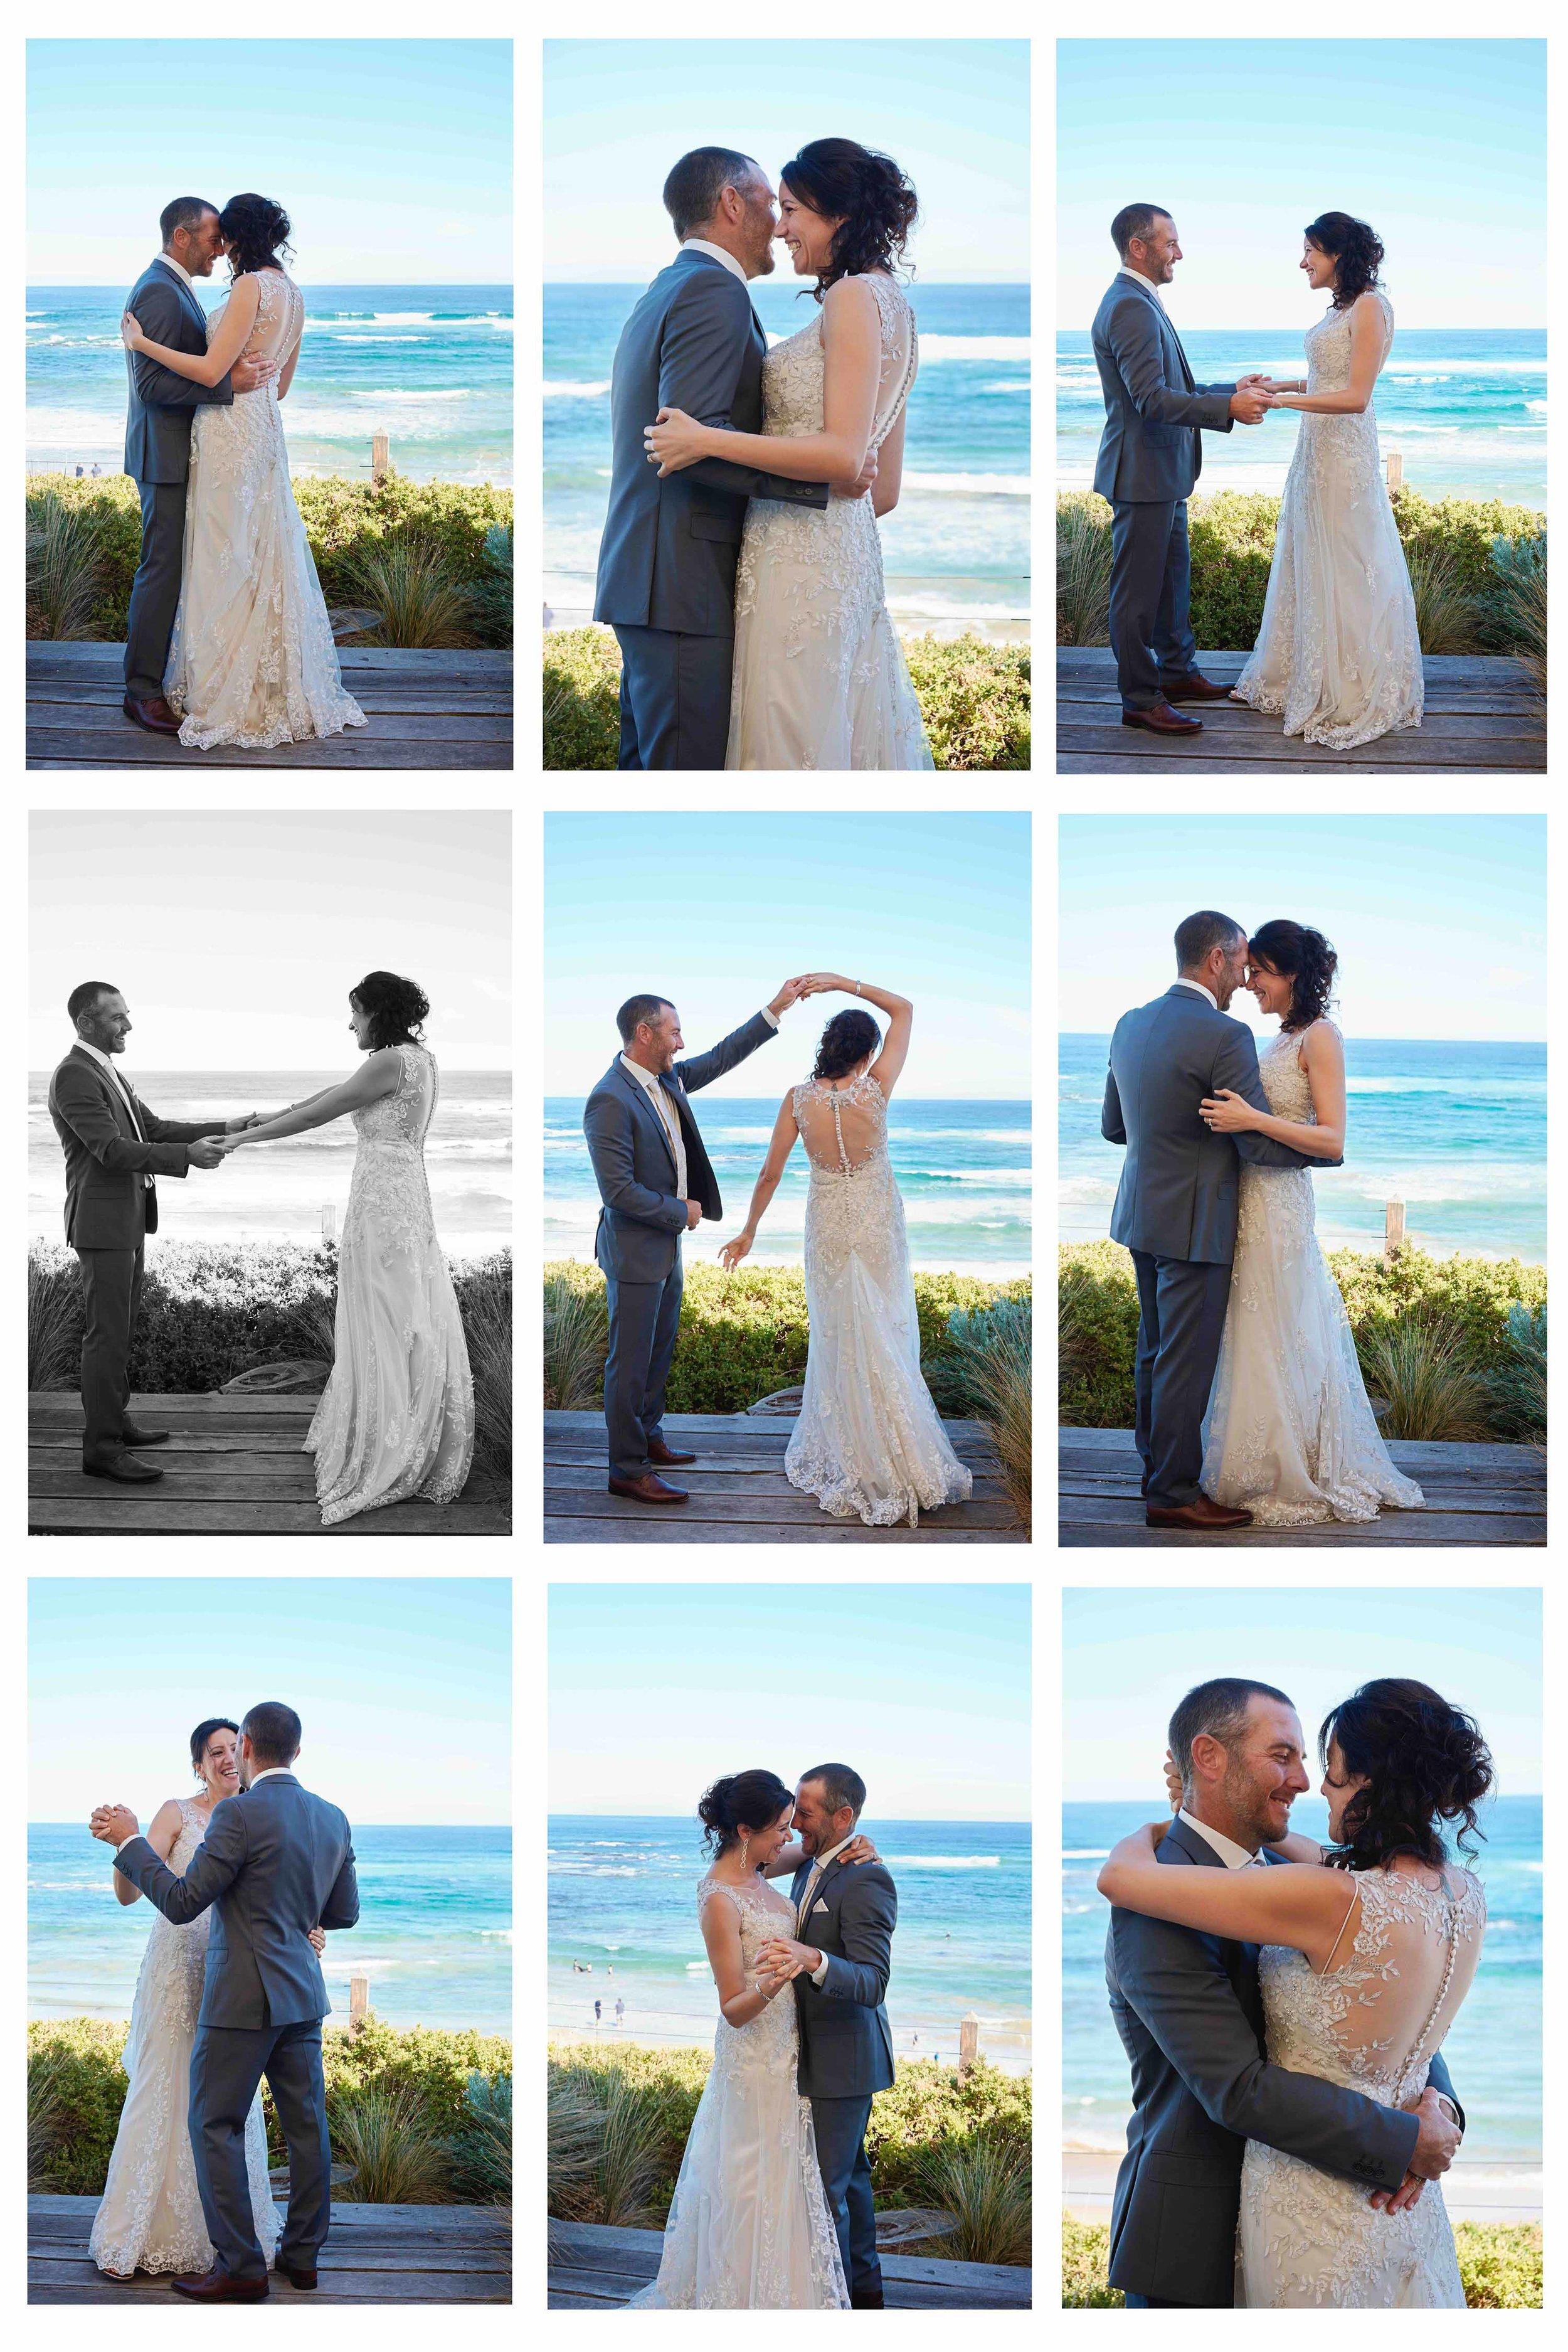 sorrento-wedding-photography-all-smiles-marissa-jade-photography-77.jpg